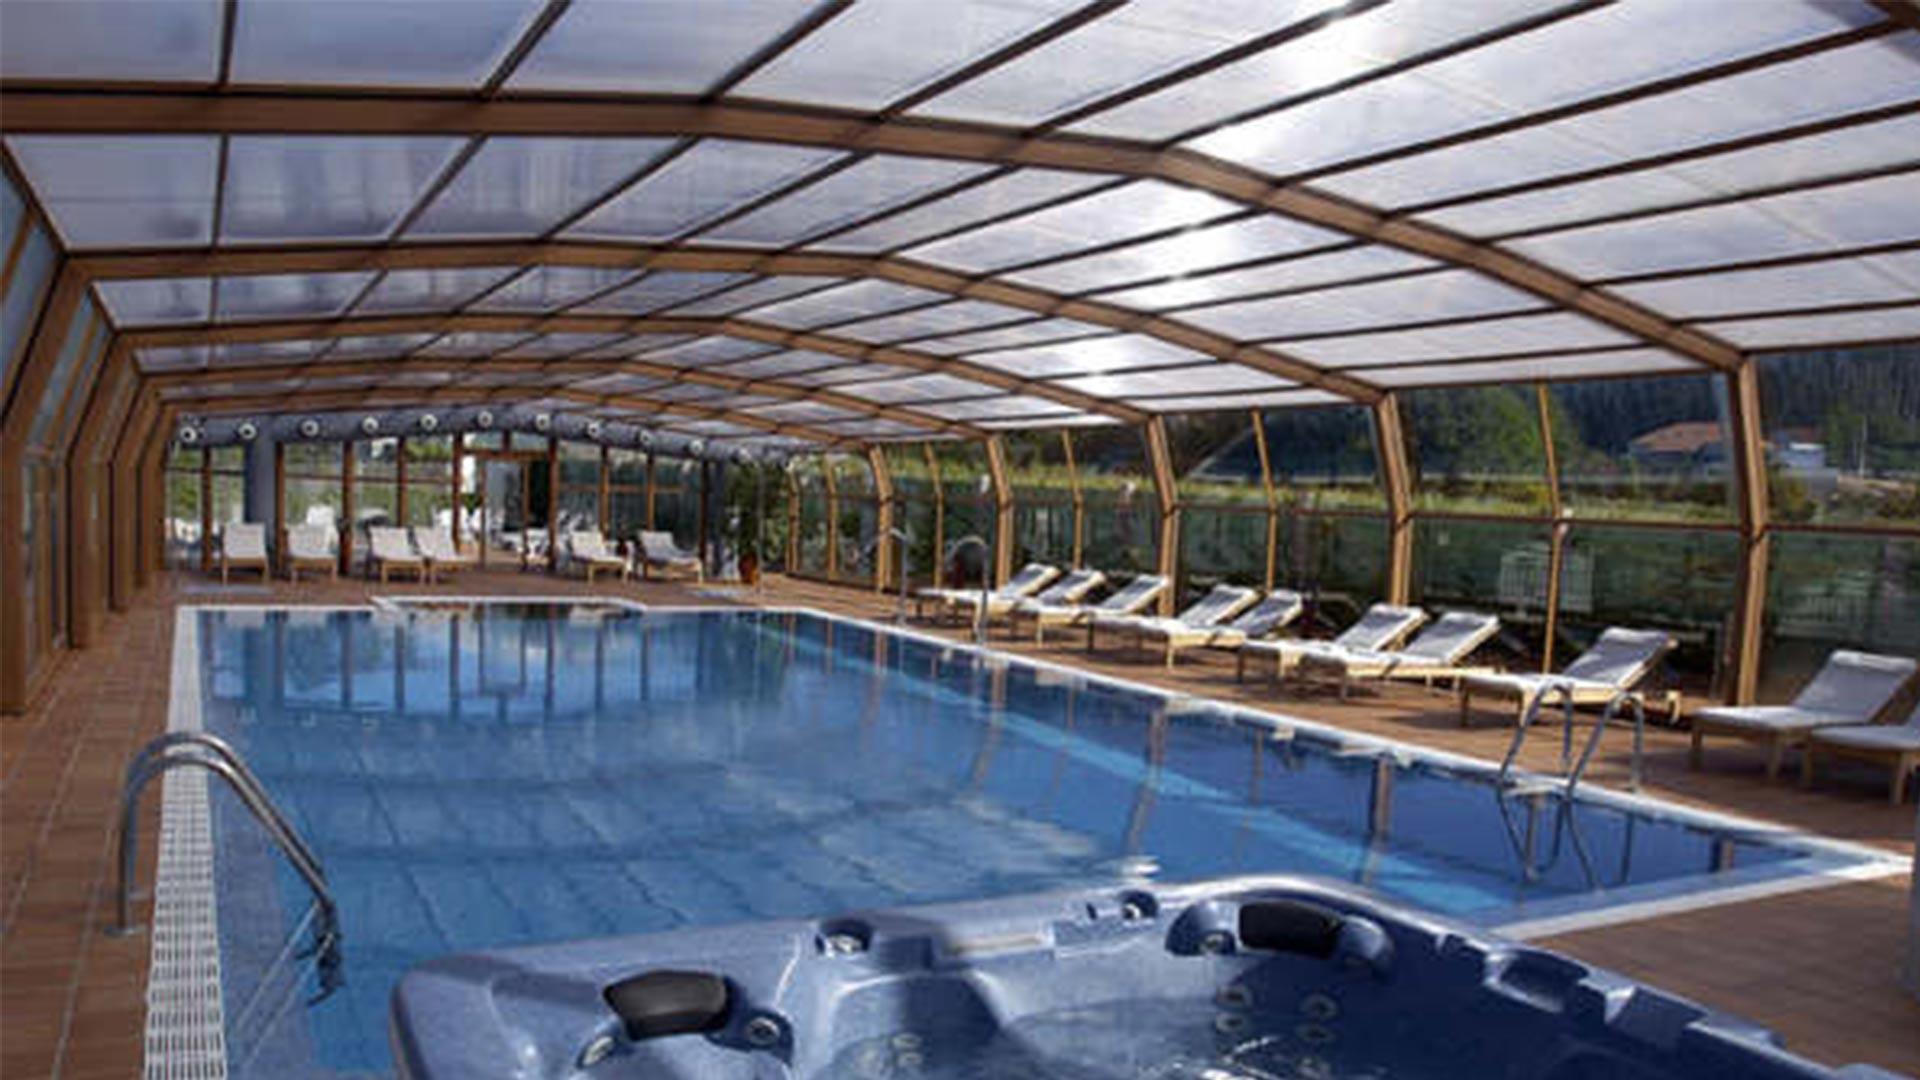 Constructeur De Piscine Montpellier fabricant d'abri piscine montpellier (hérault) | bel abri